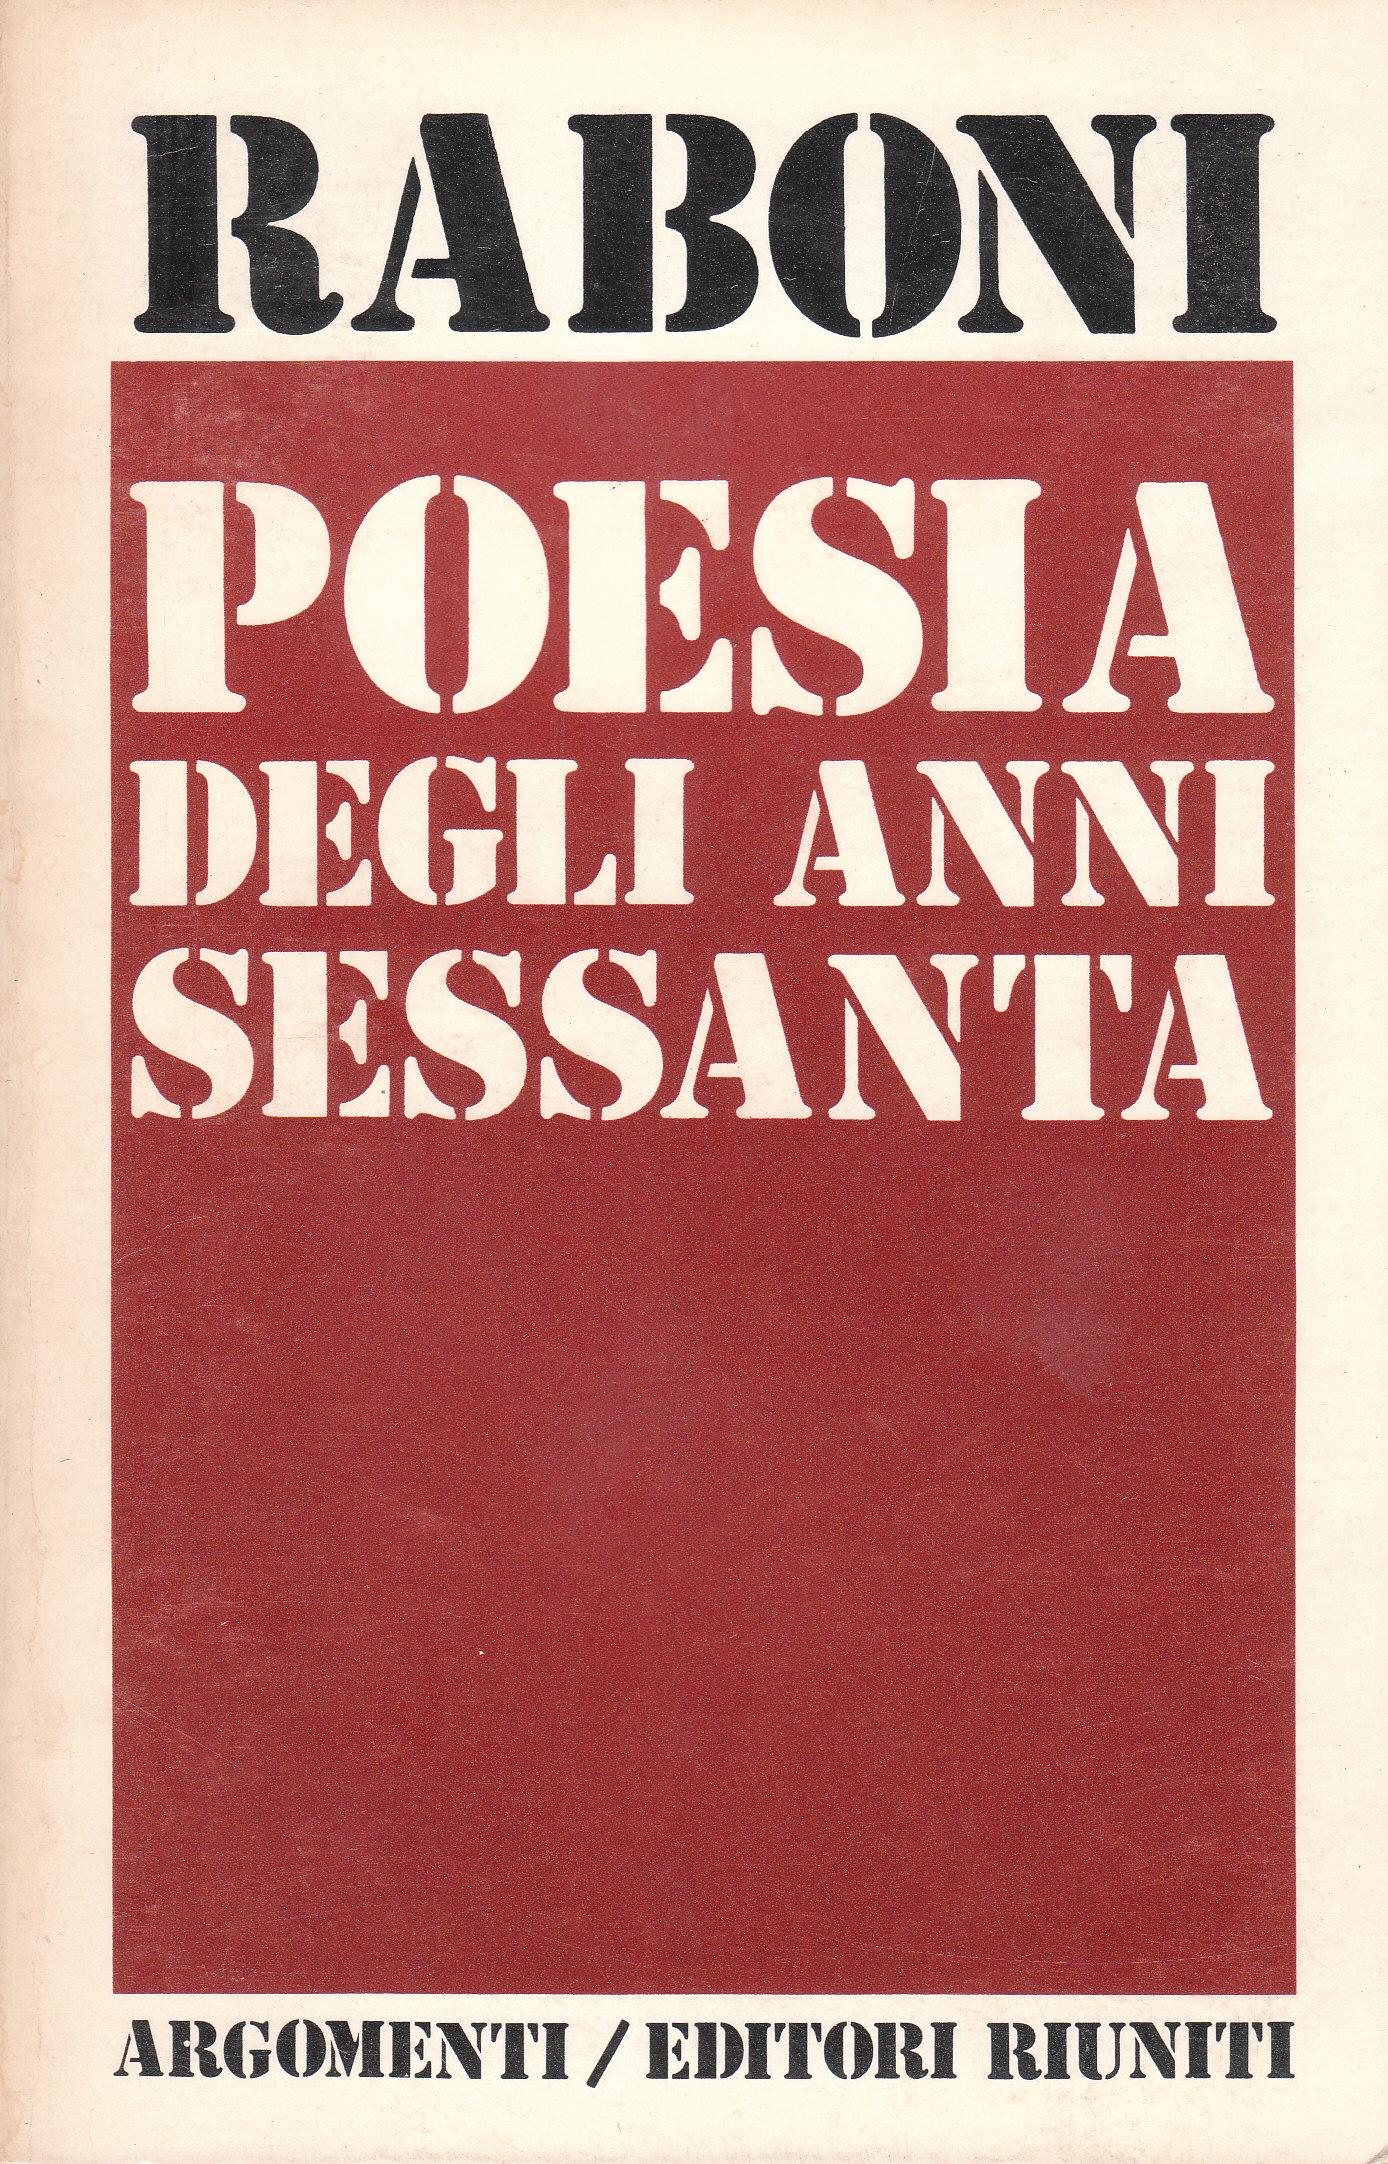 Poesia degli anni sessanta